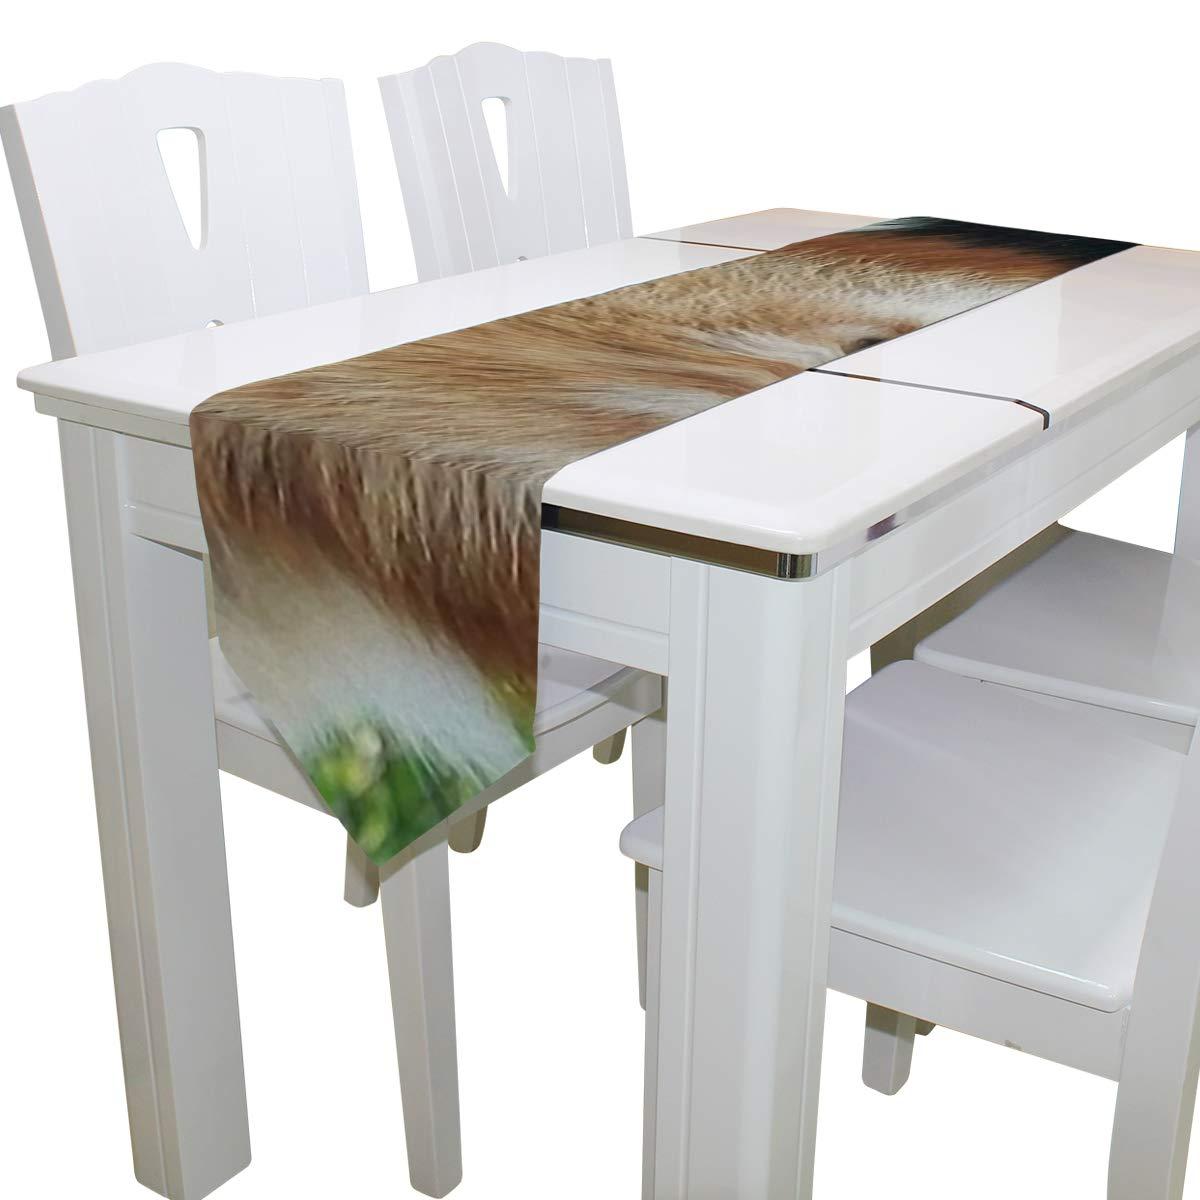 Dining Table Runner Or Dresser Scarf, Fort Wayne Children